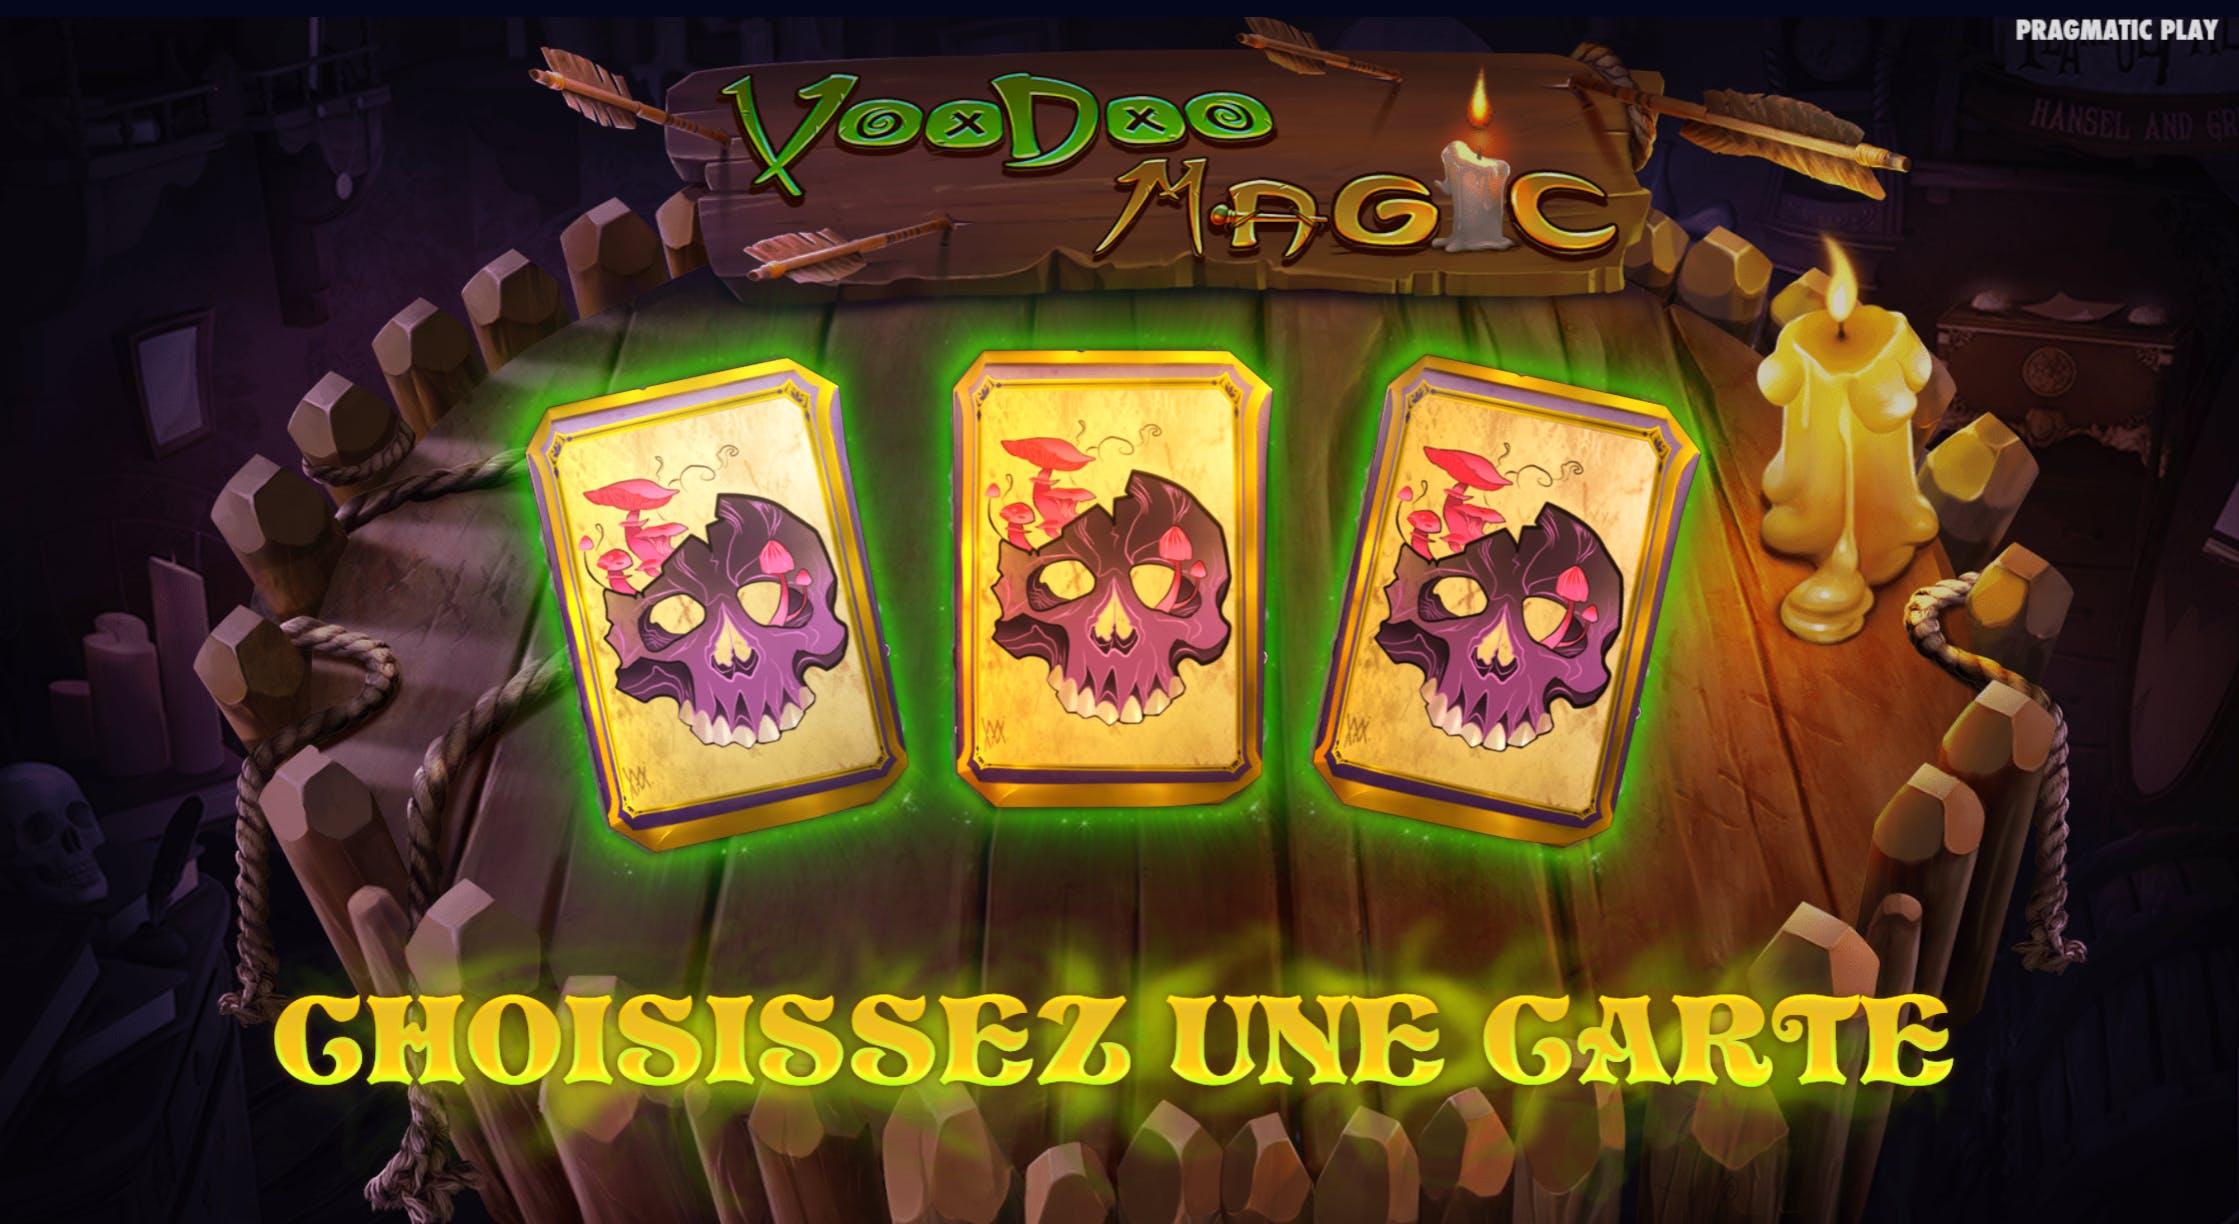 voodoo magic freespins provider pragmatic play gameplay